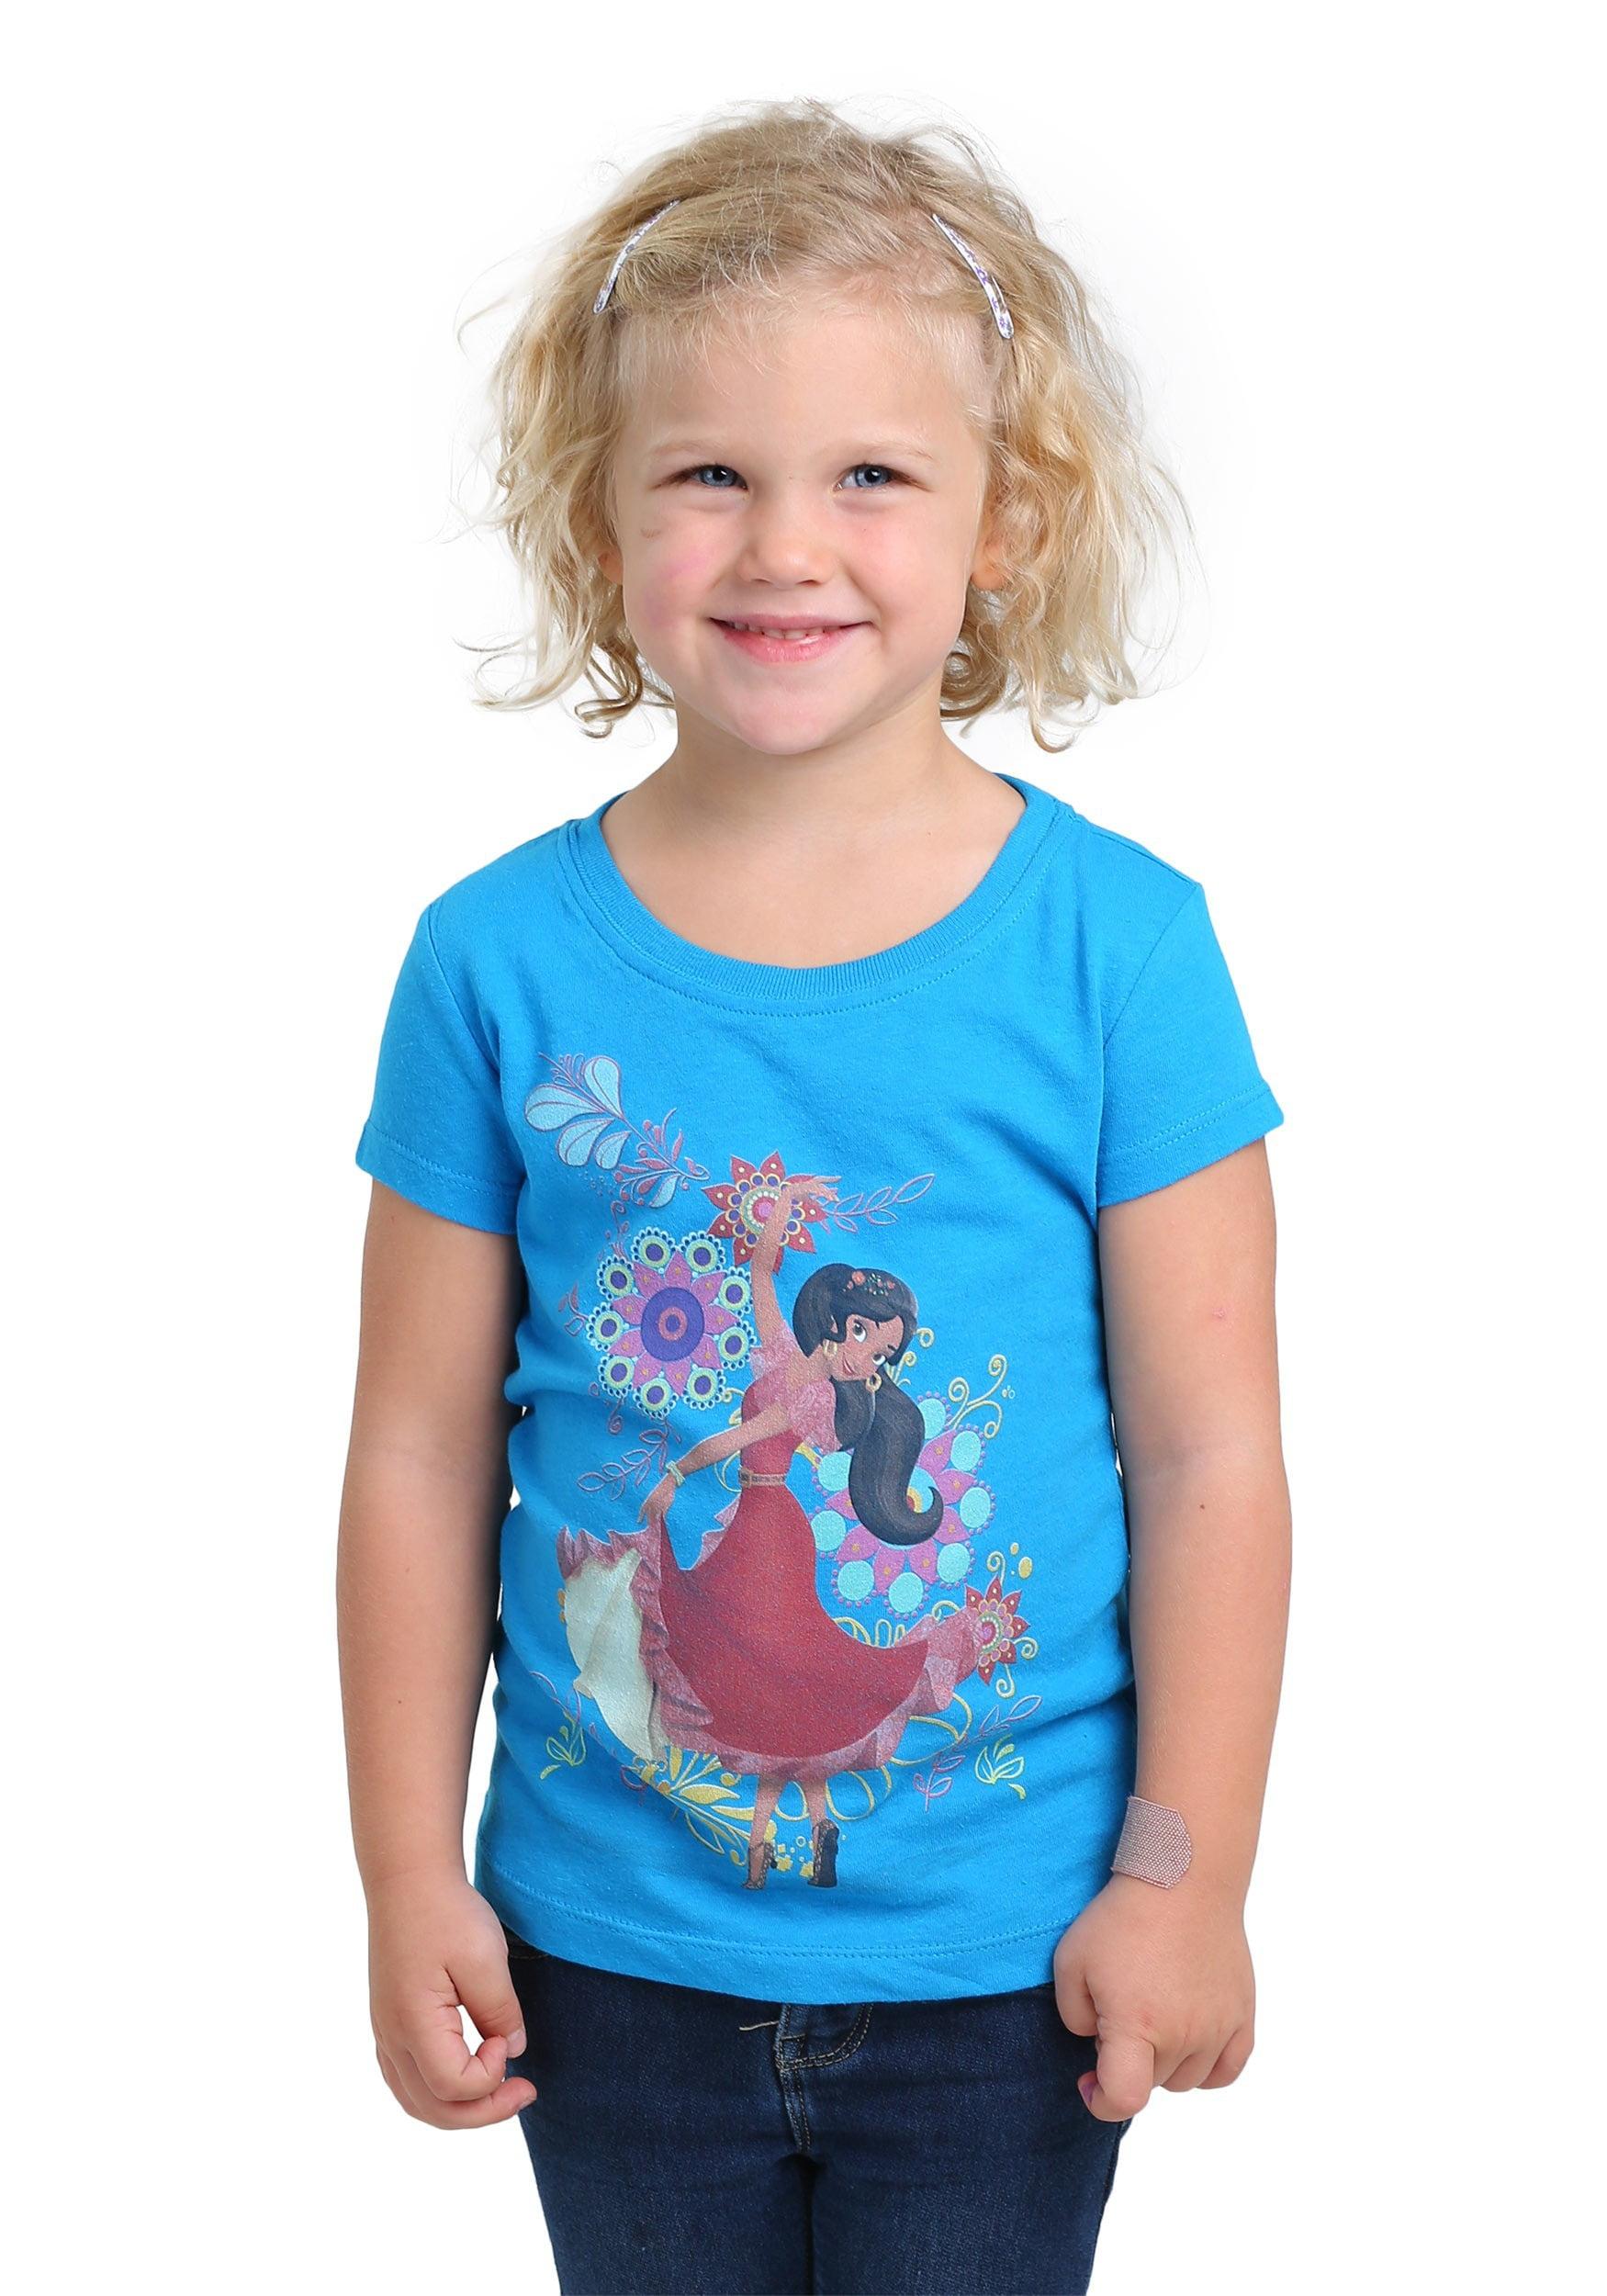 elena of avalor elena dancing girls t-shirt